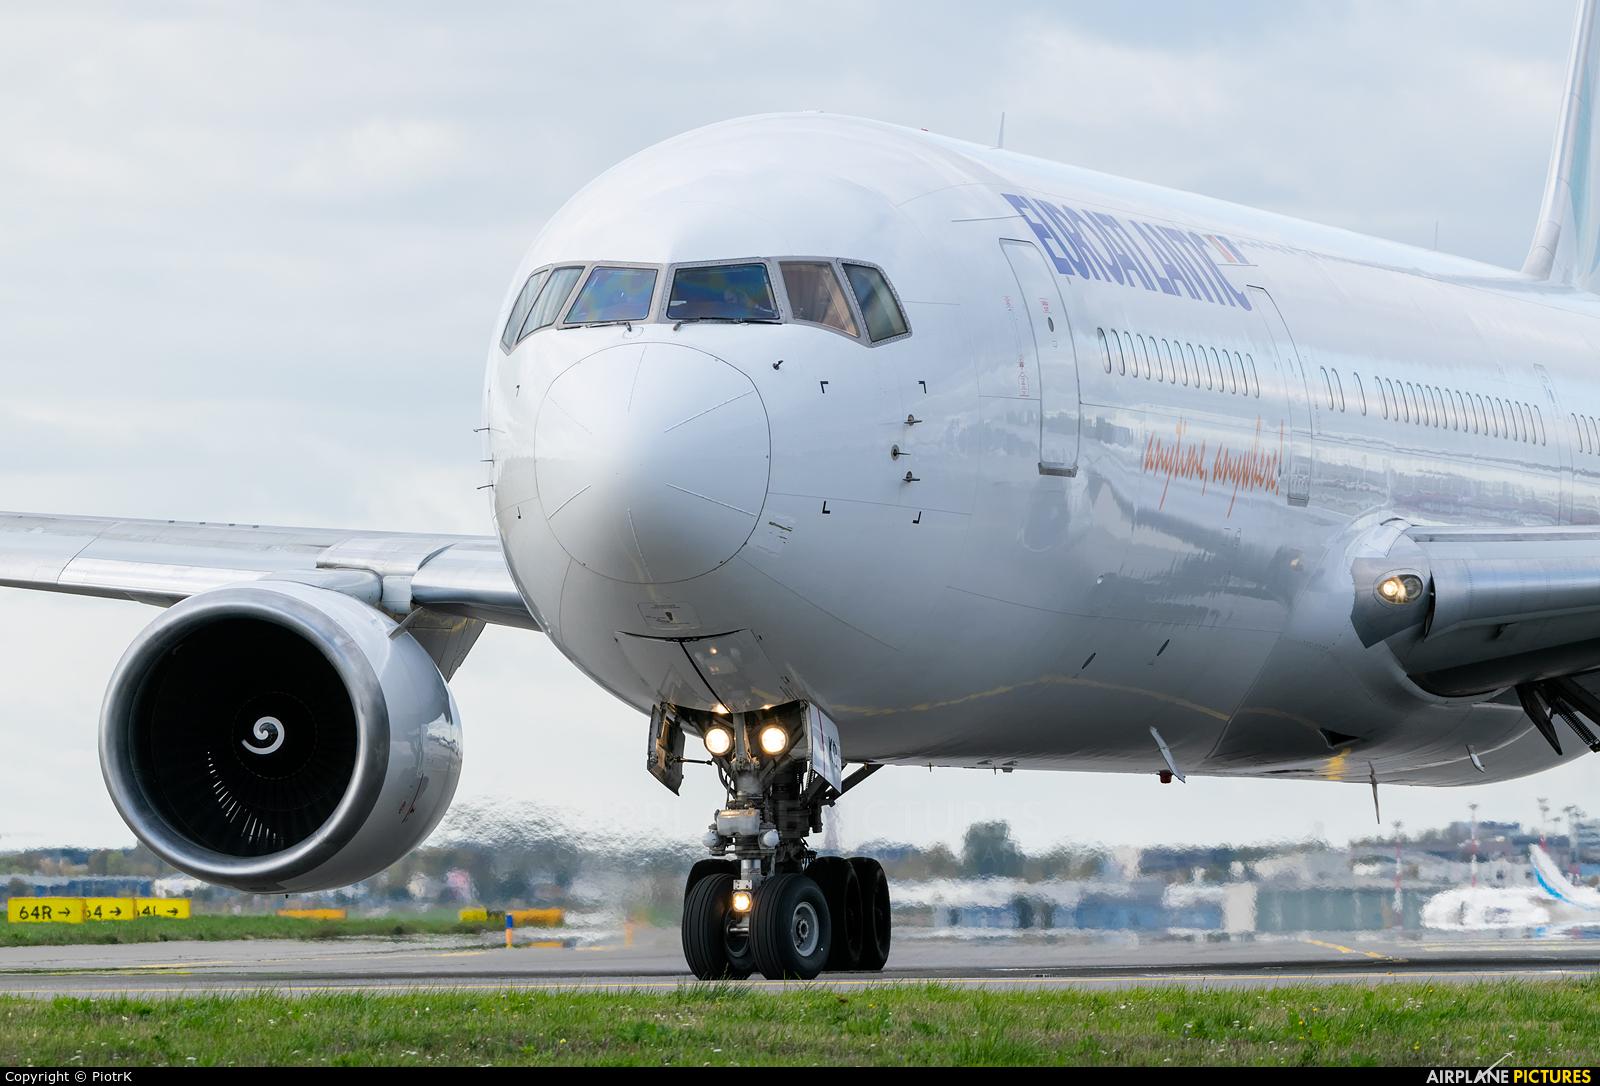 Euro Atlantic Airways CS-TKR aircraft at Warsaw - Frederic Chopin